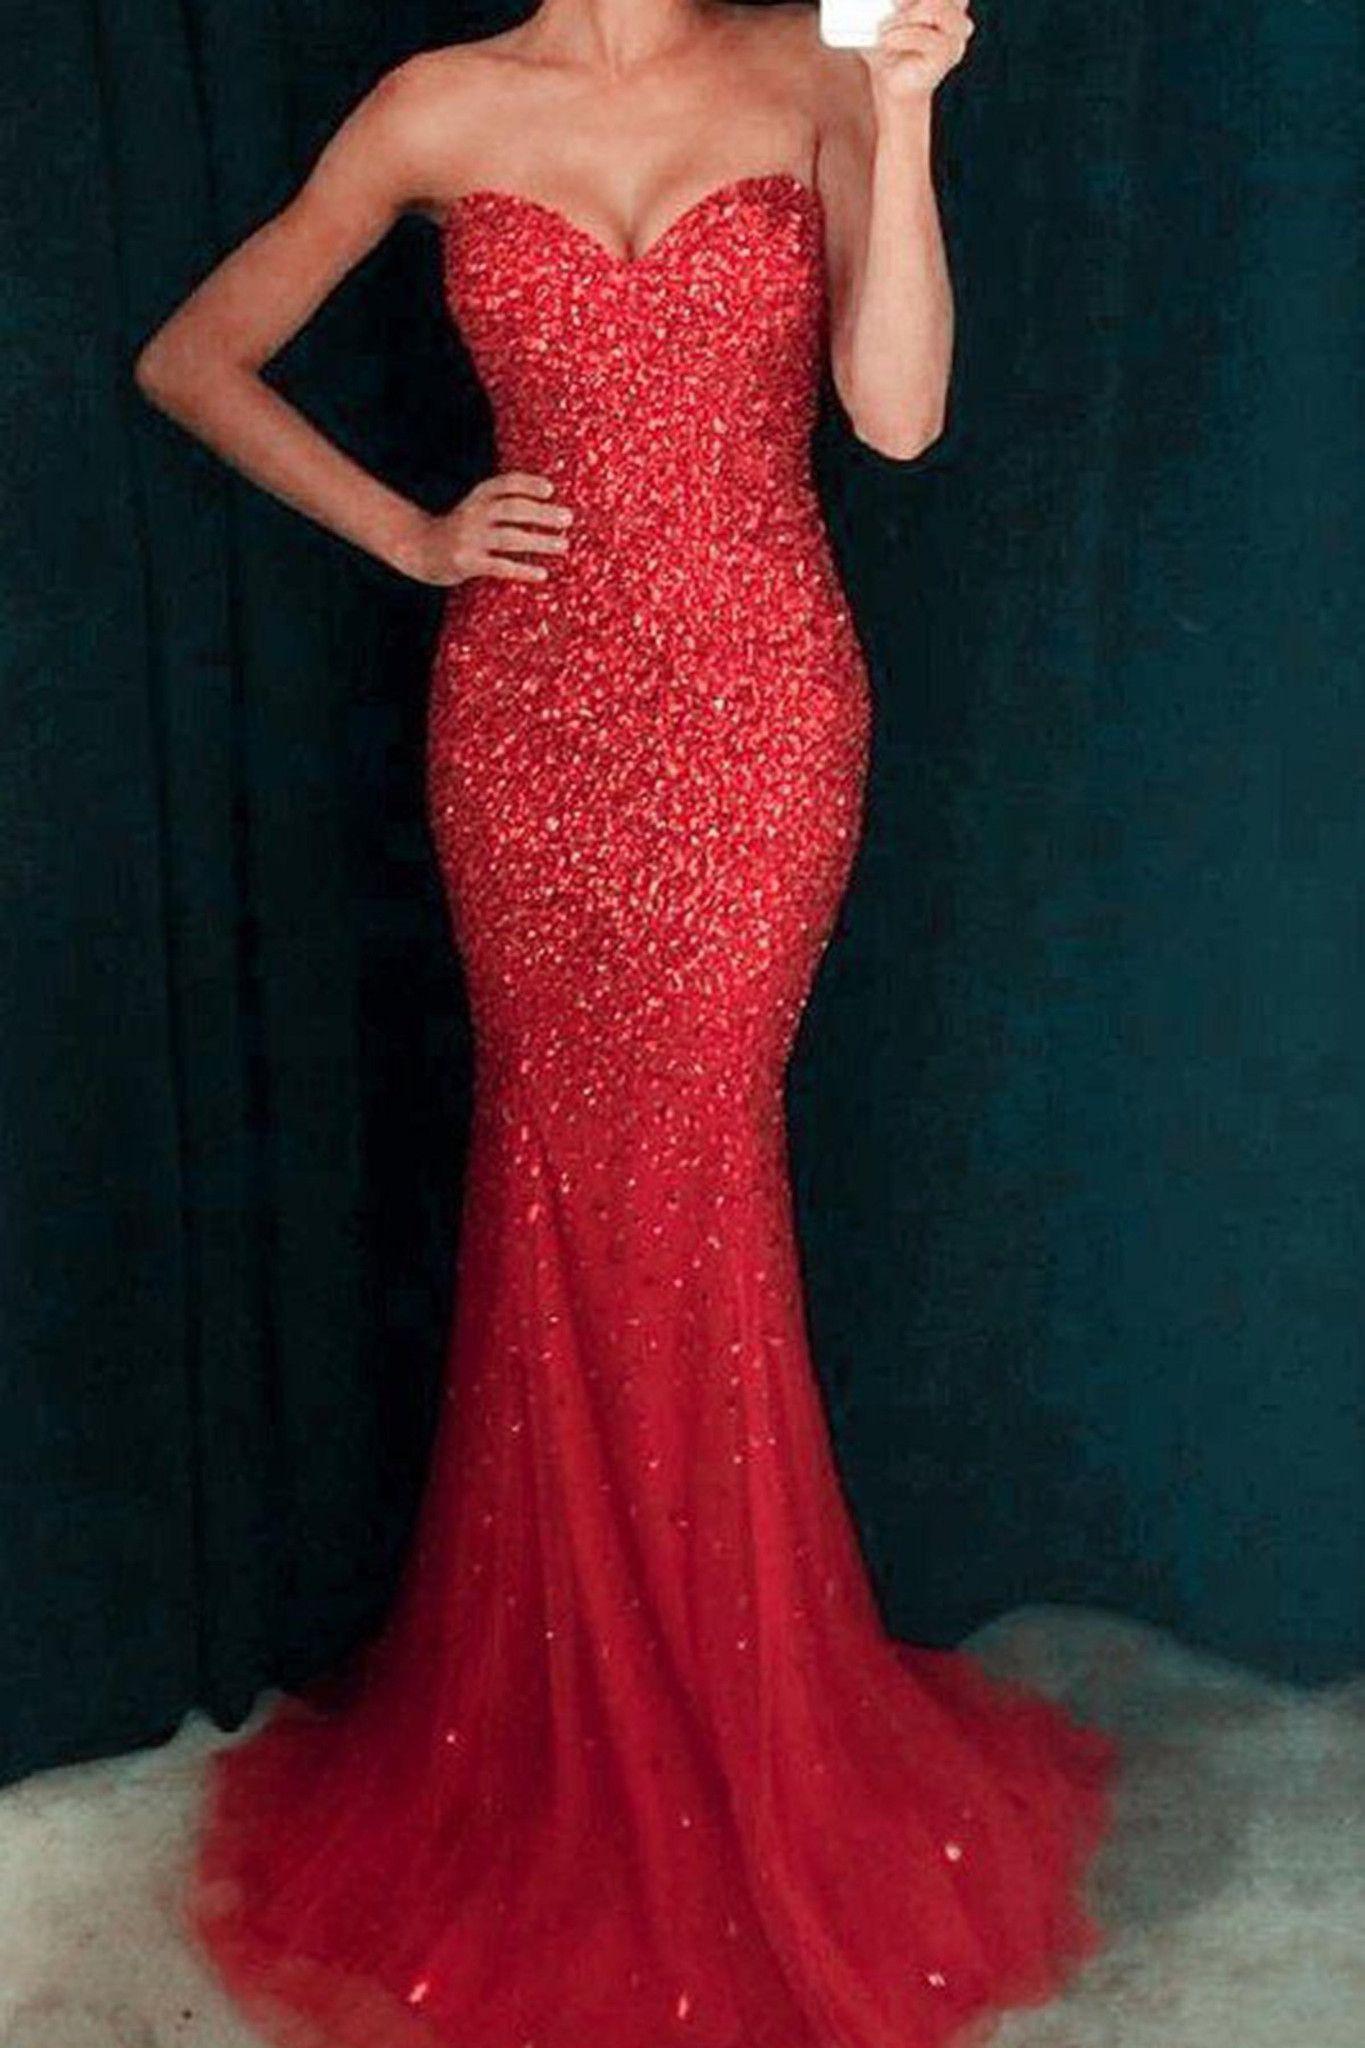 e81a9c137a61 Red sequins sweetheart floor-length mermaid prom dresses | Dresses I ...